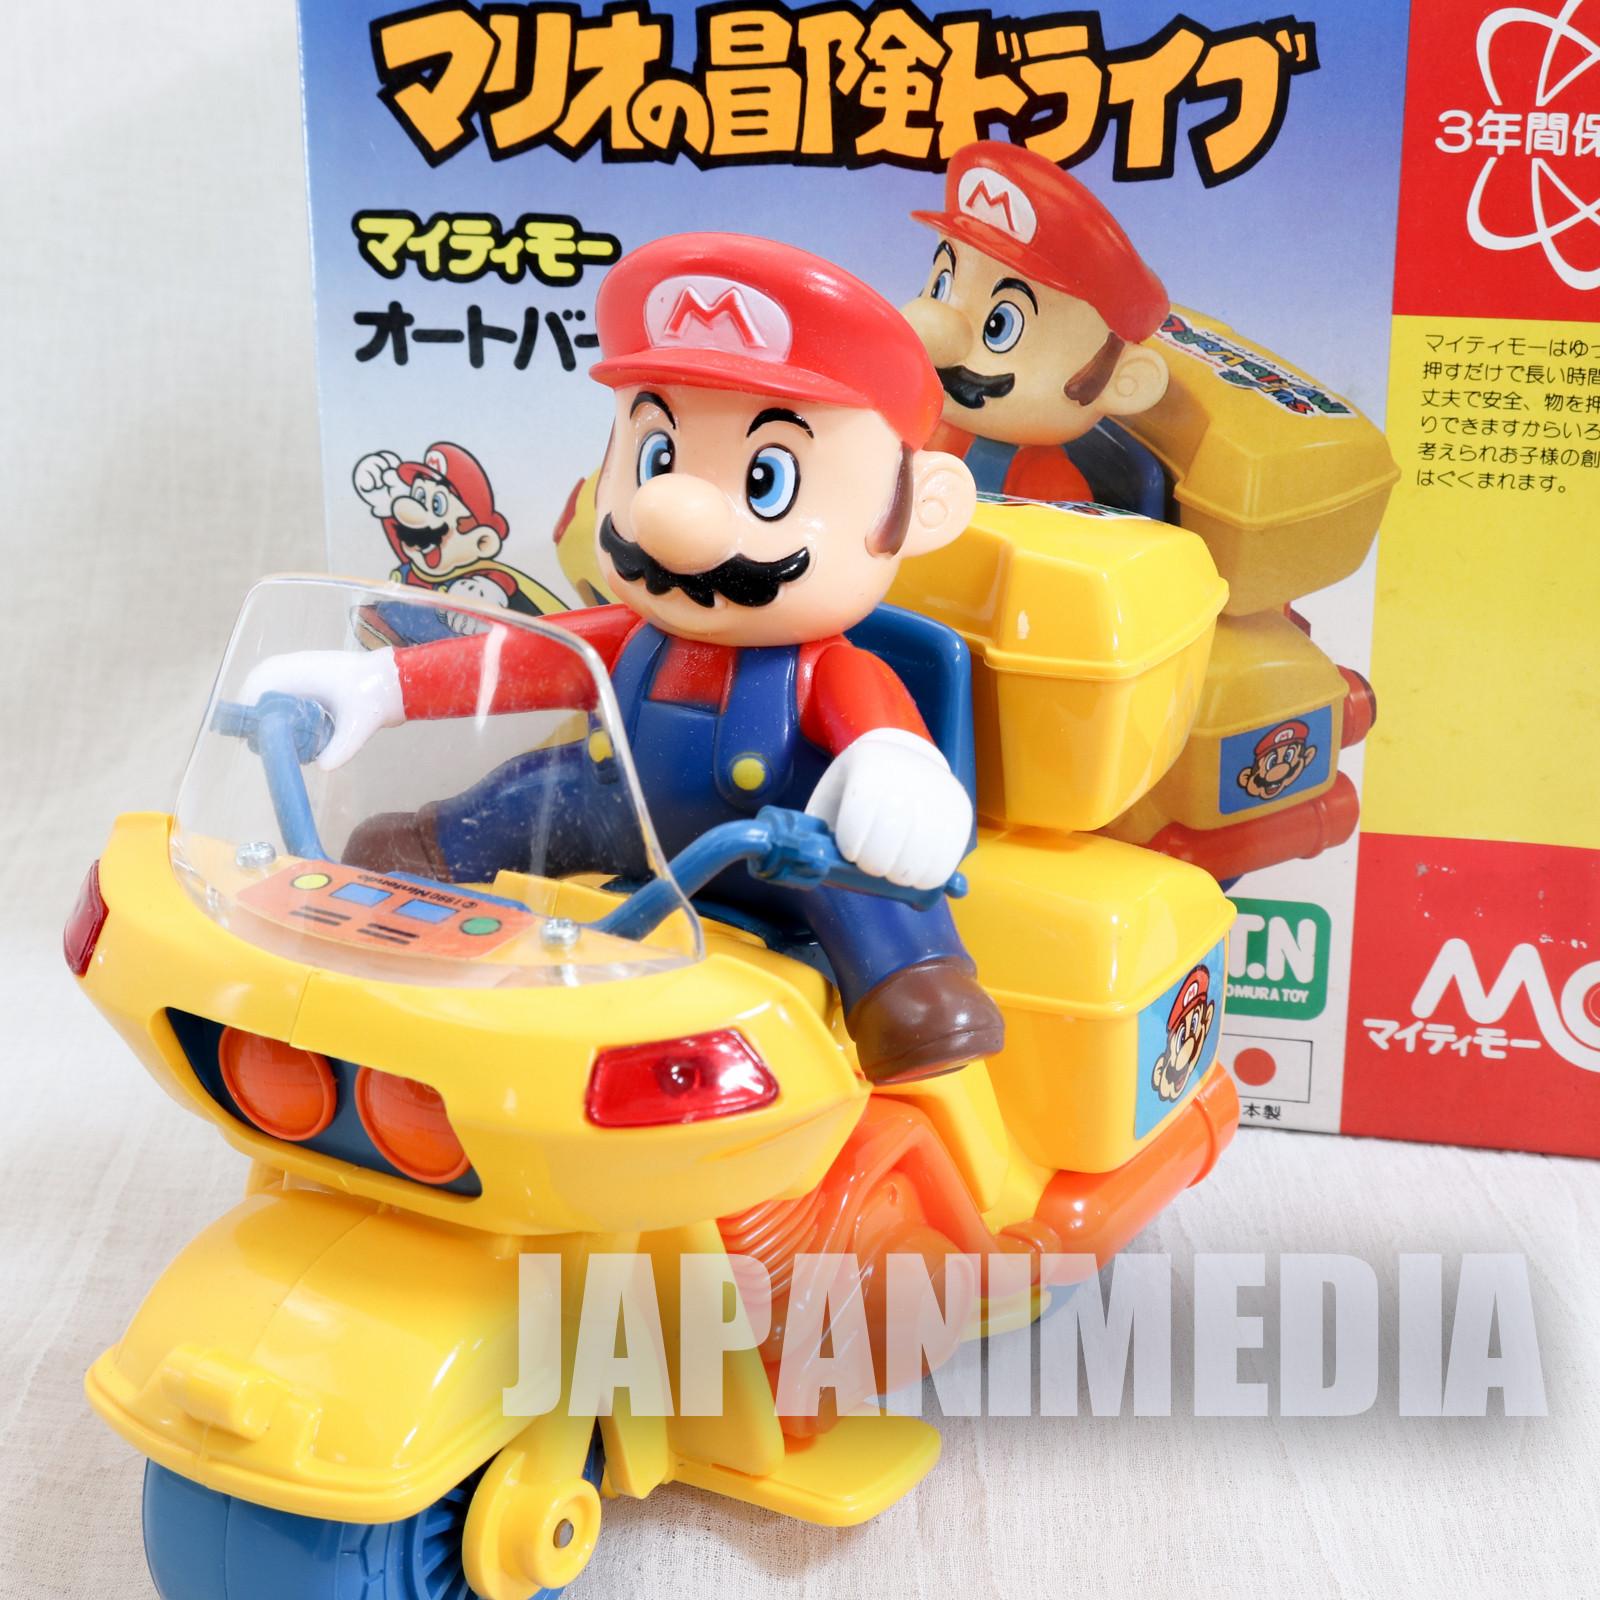 Retro RARE! Super Mario World Mario on Motorcycle Figure Nomura Toy JAPAN